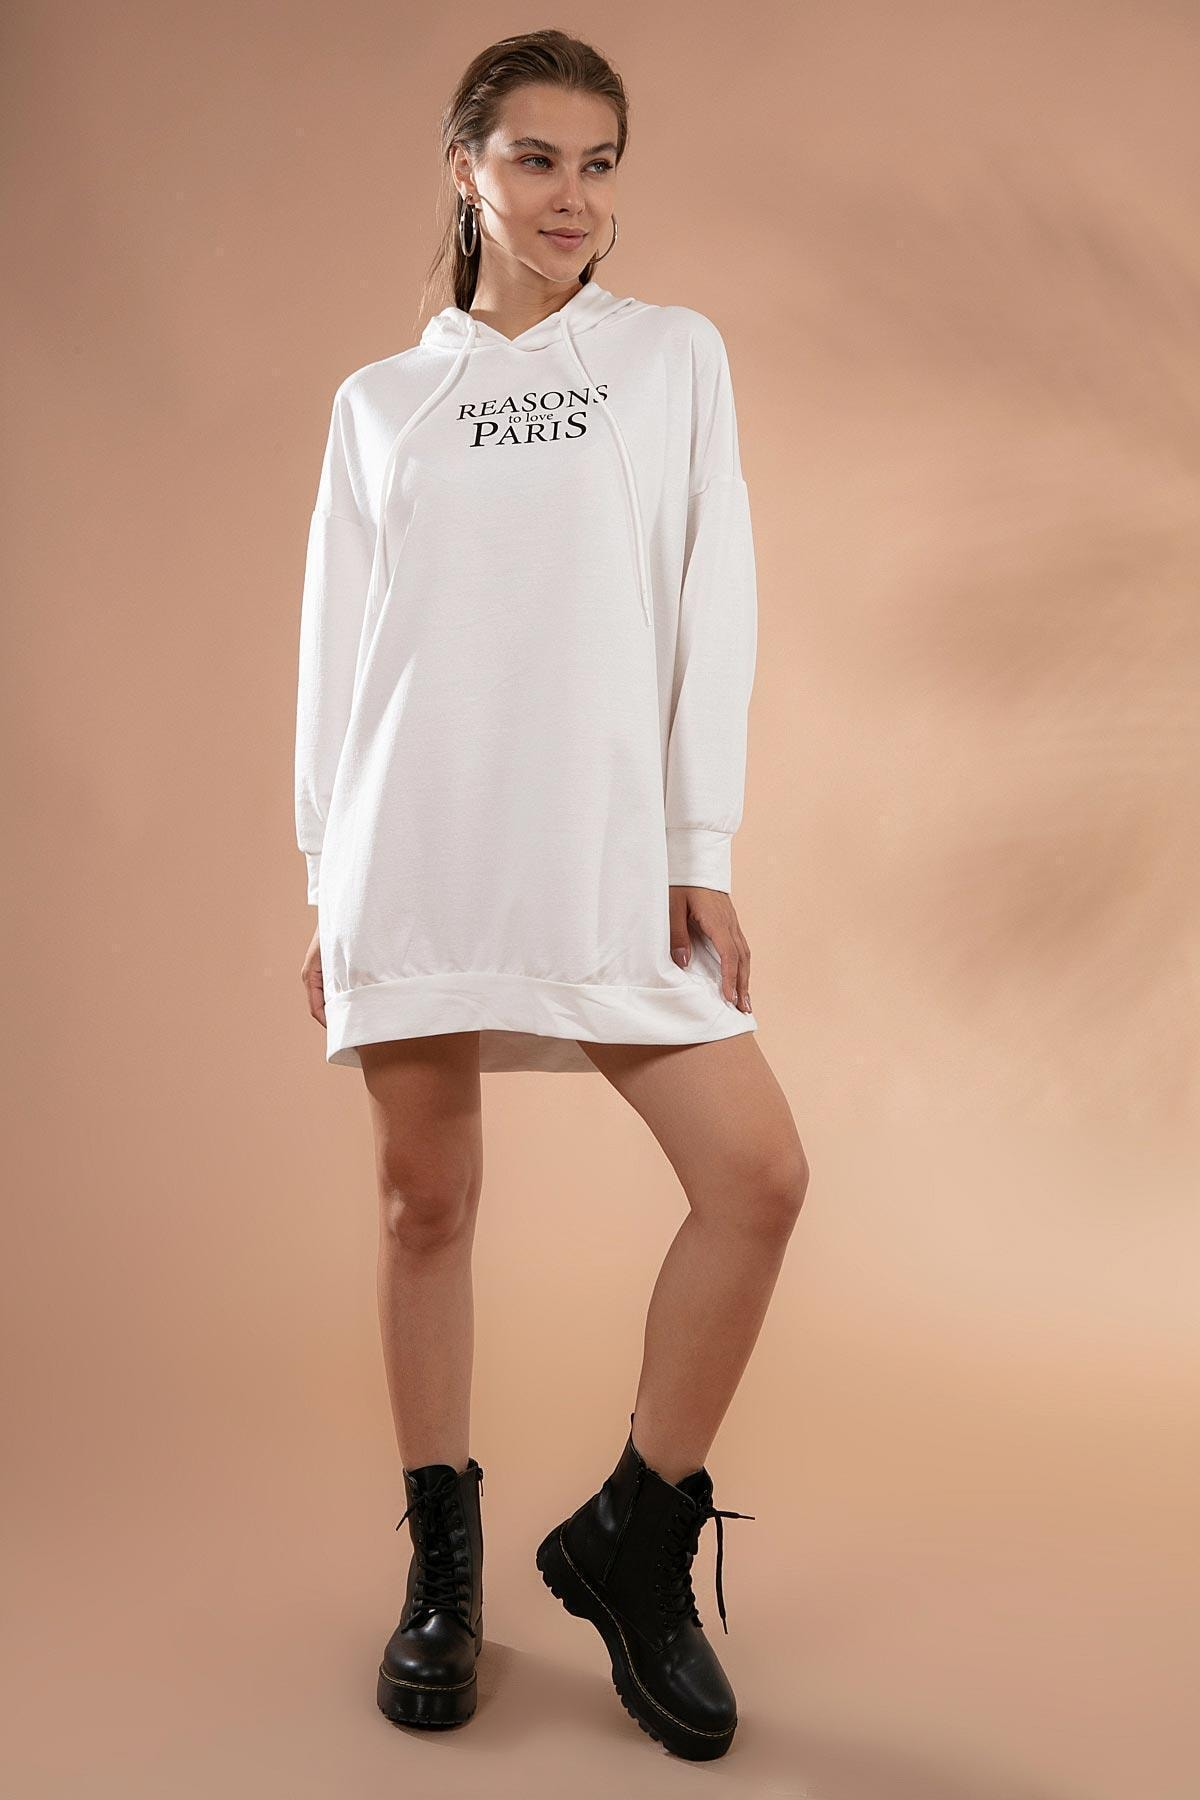 Pattaya Kadın Oversize Sweatshirt Elbise Y20w110-51355 1